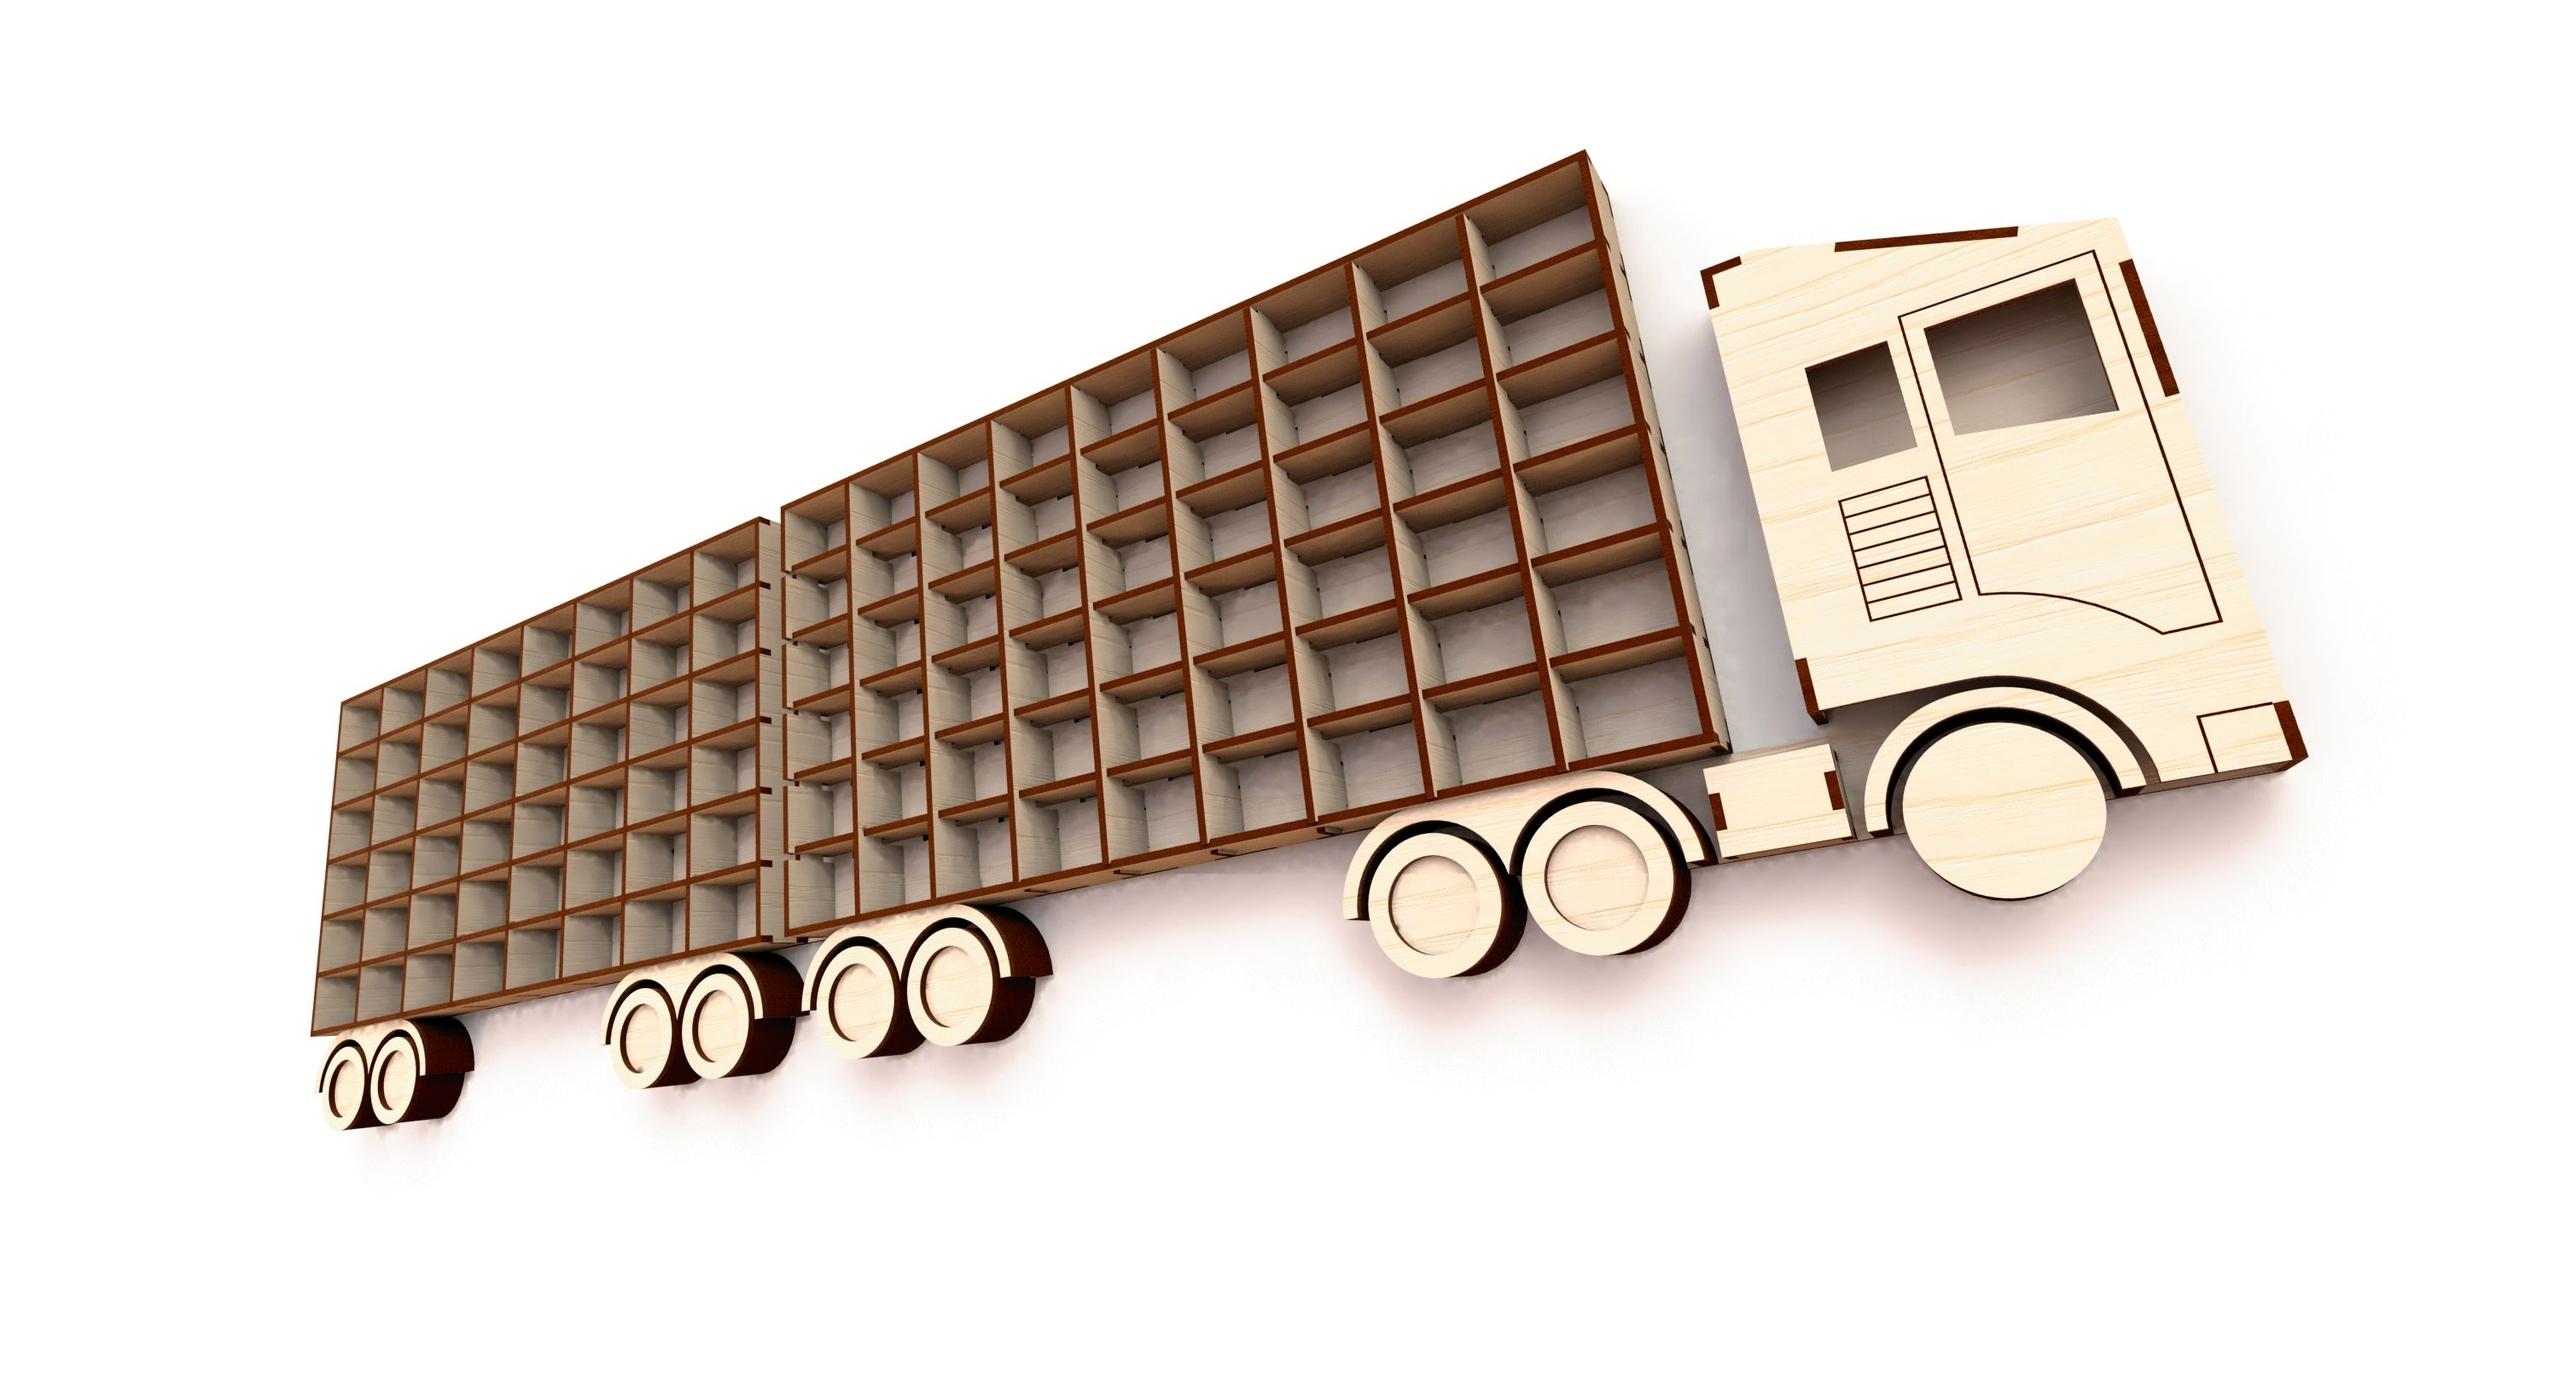 Laser Cut Shelf Truck with Trailer Free Vector